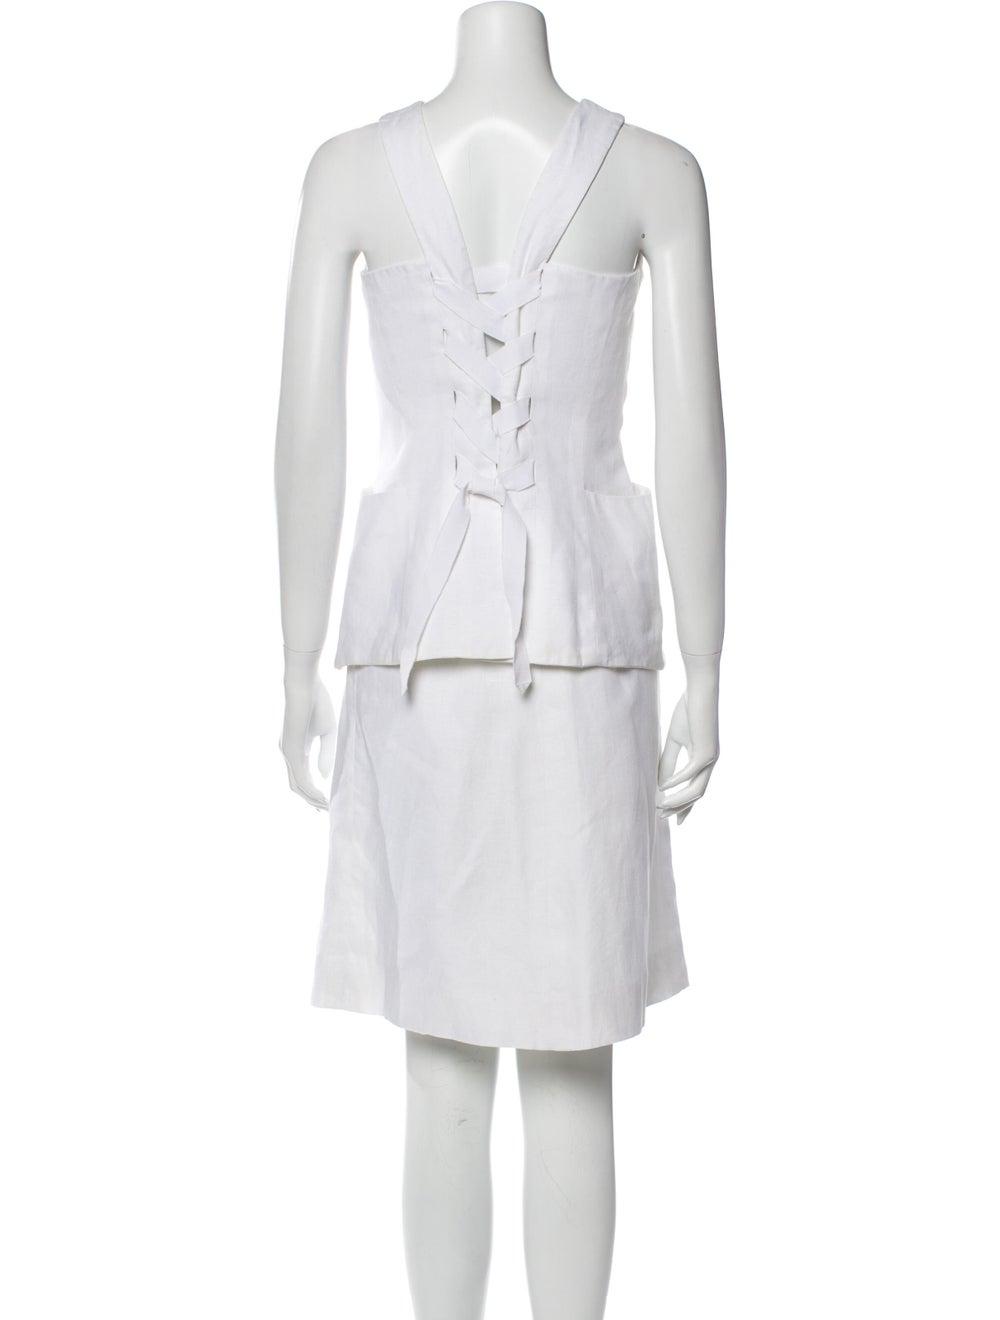 Hermès Vintage Linen Skirt Set White - image 3